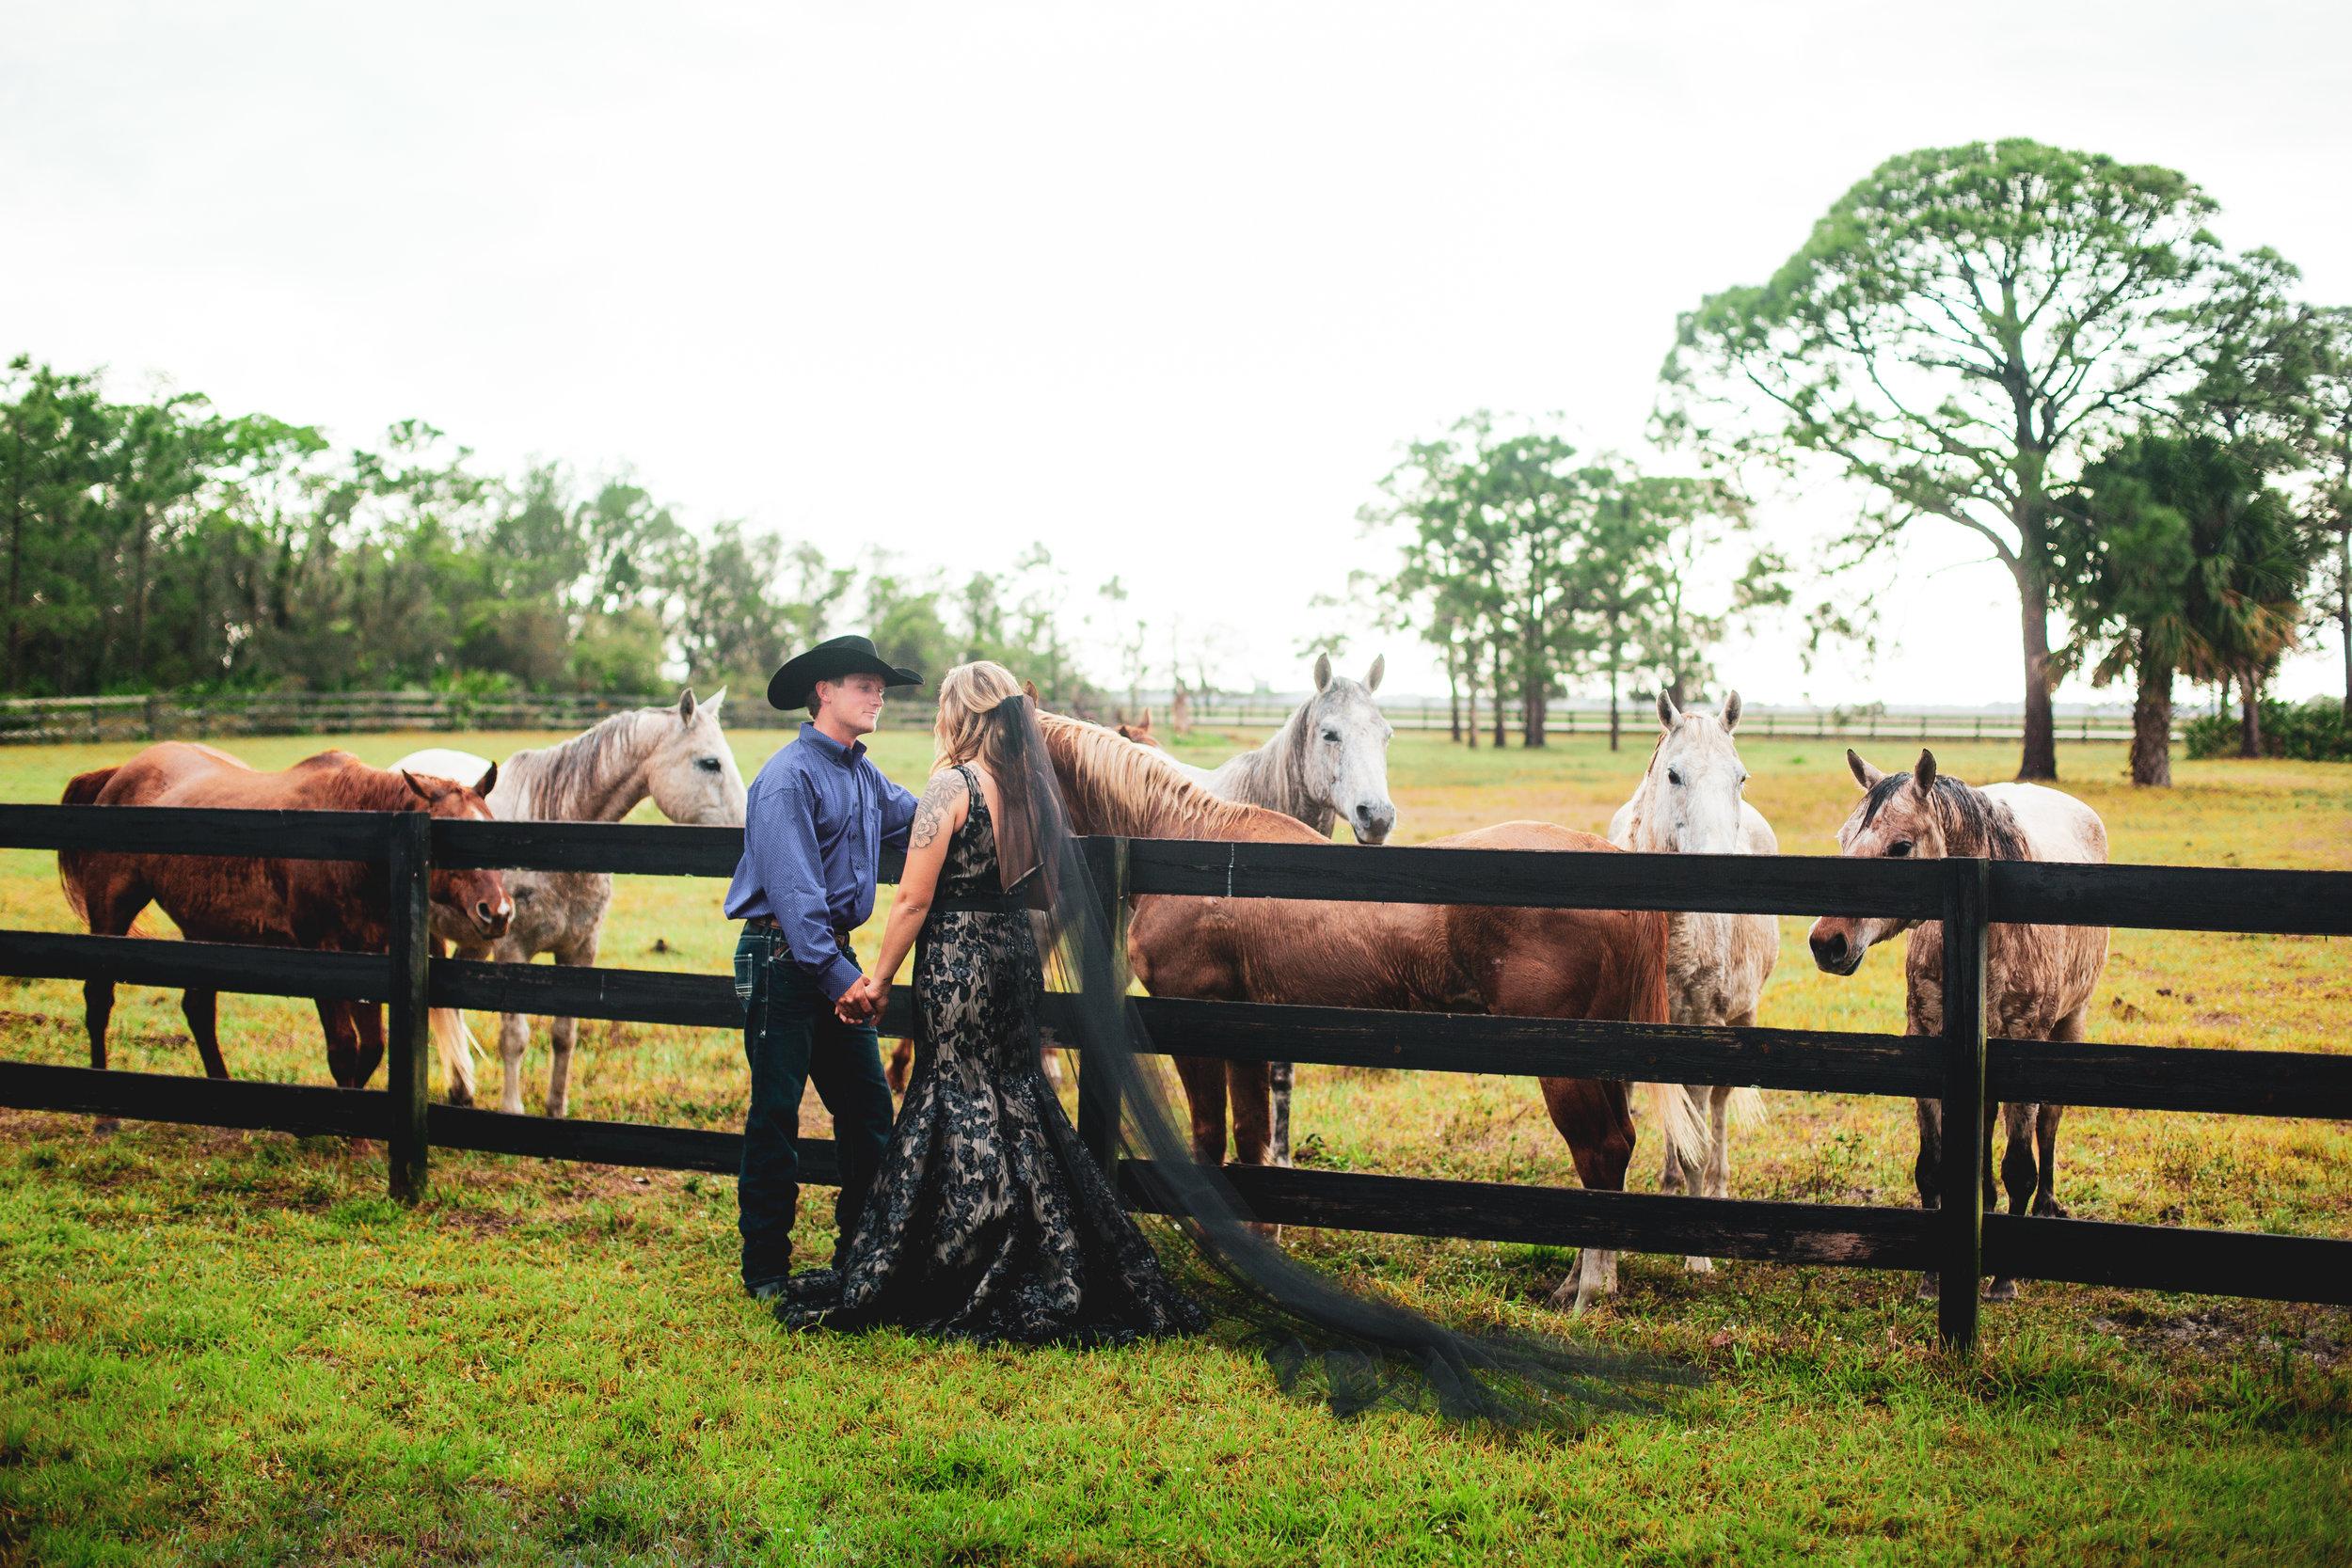 kelilina photography and films florida wedding photography videography 014-5.jpg